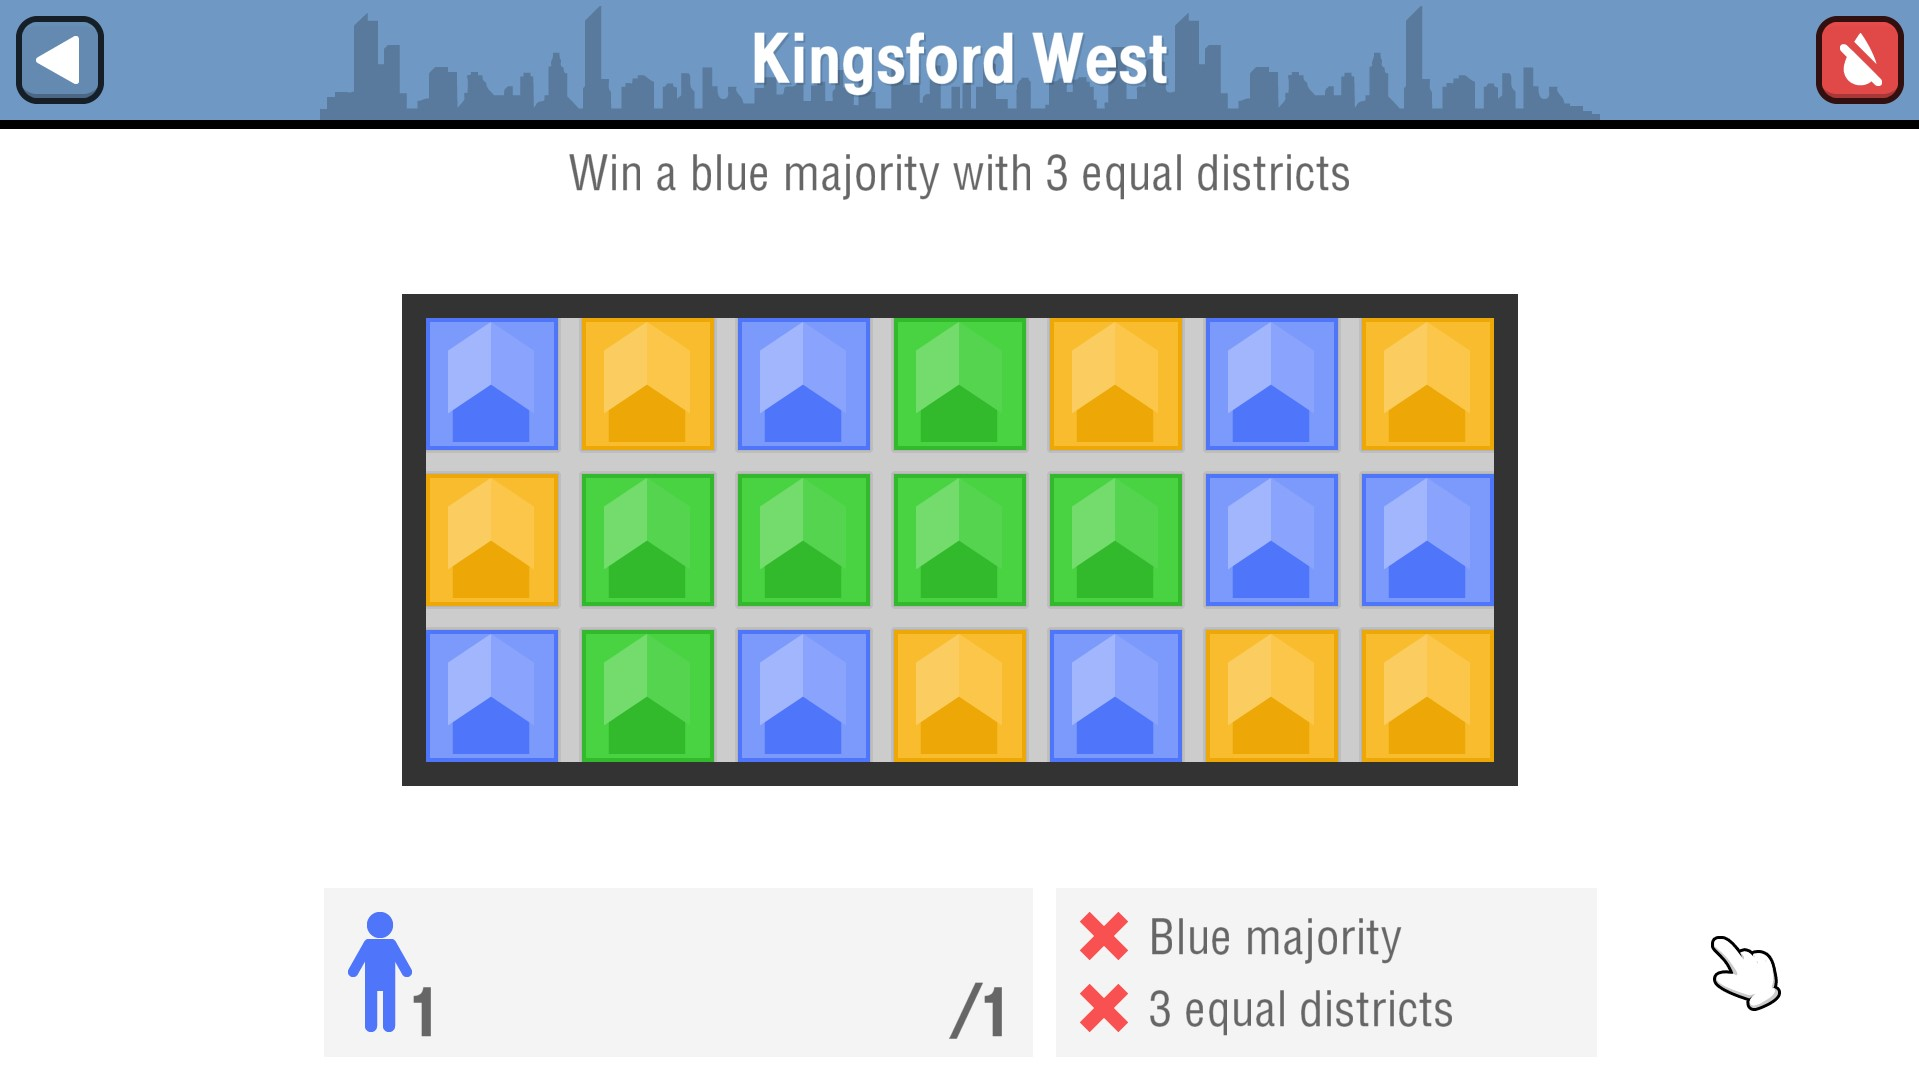 Kingsford West